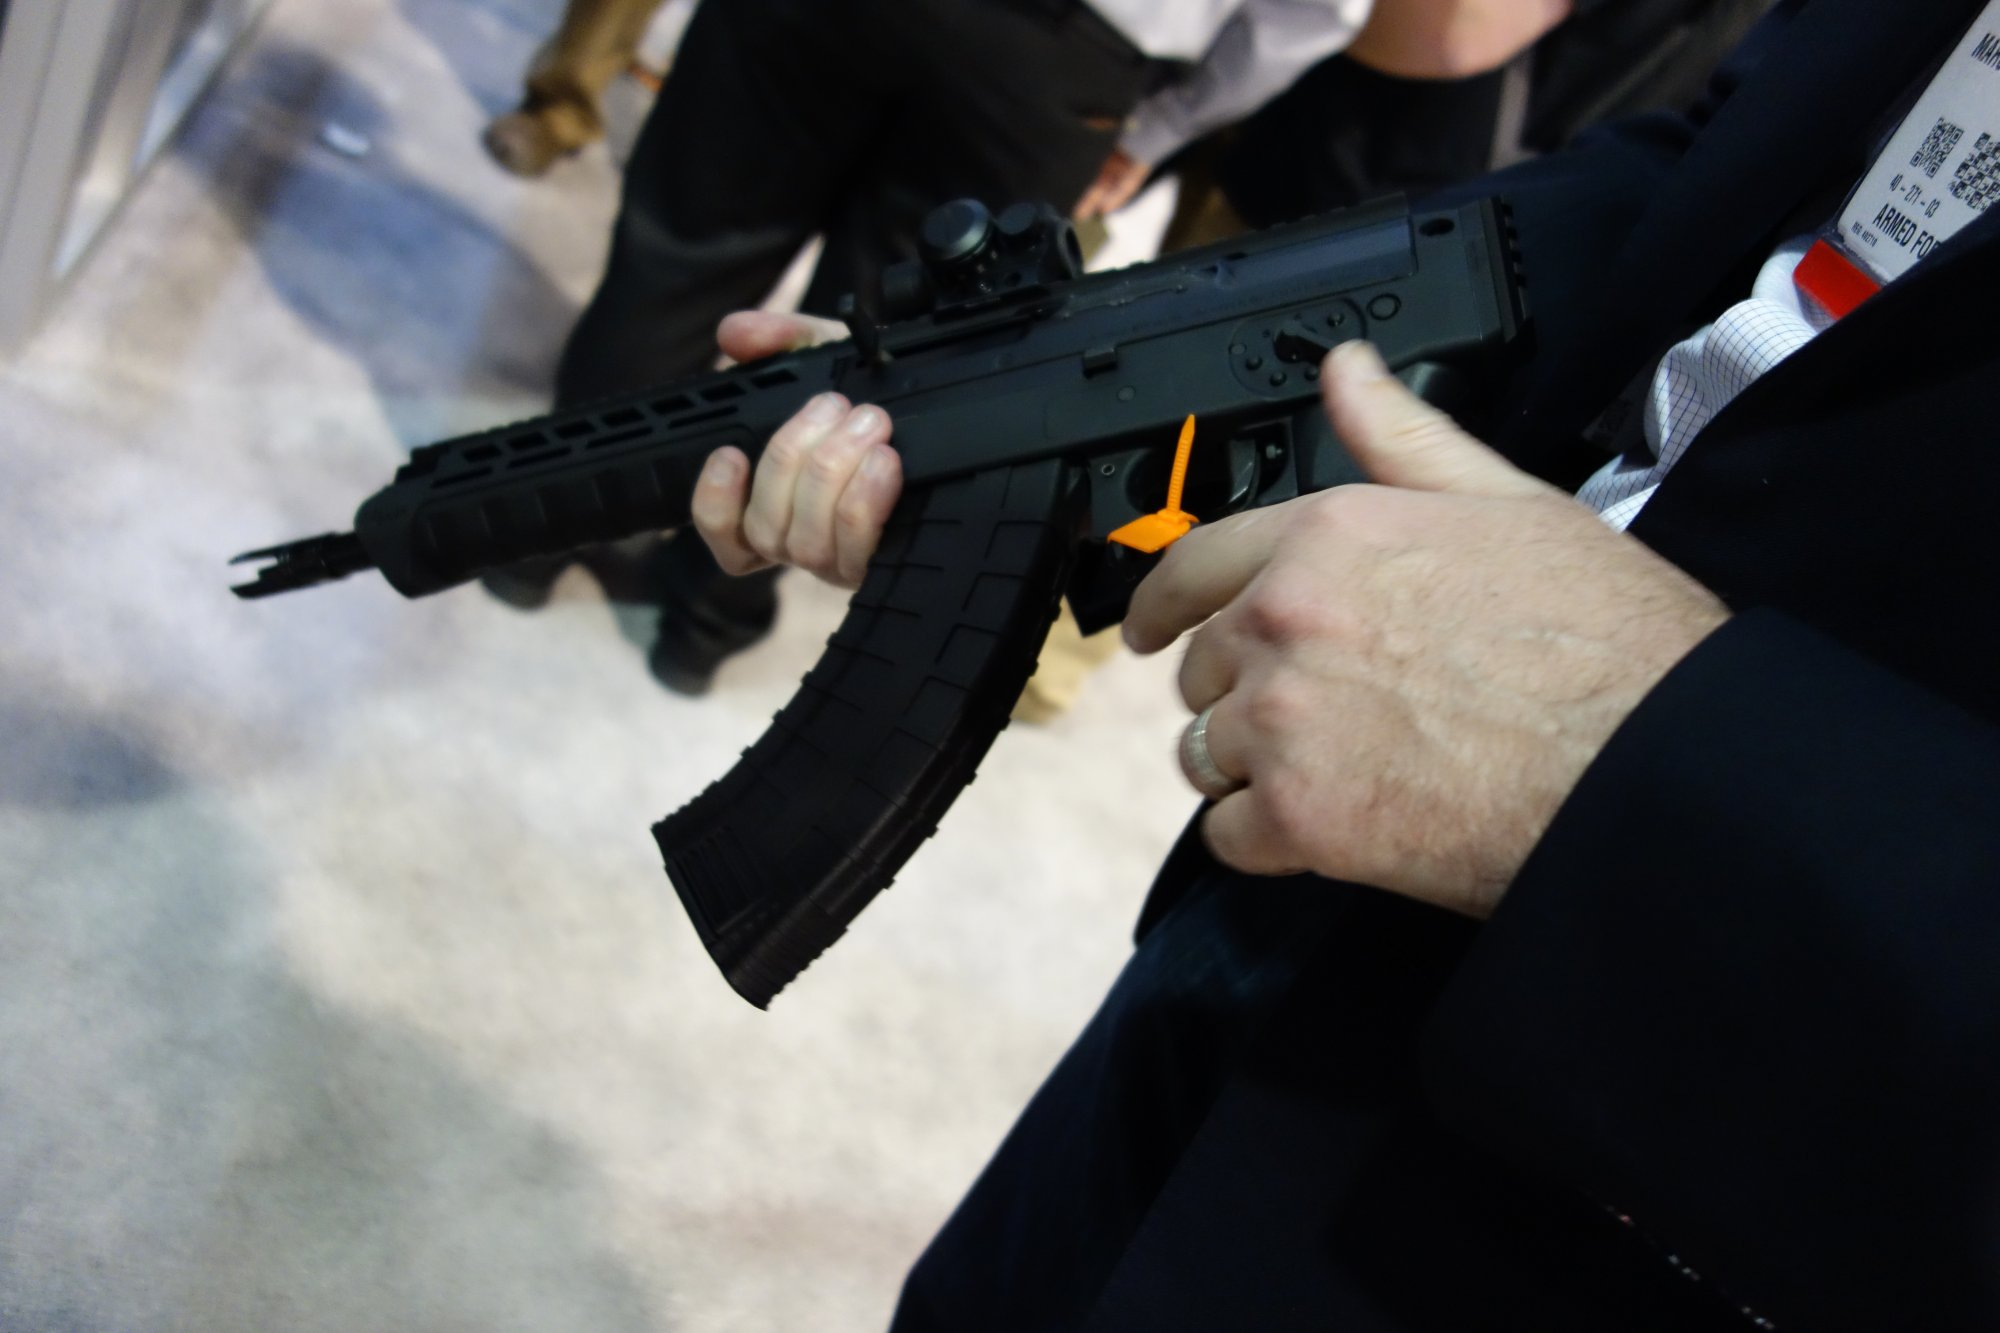 SIG SAUER SIG556xi 7.62x39mm Russian Configuration Semi Auto Only Modular Multi Caliber Combat Tactical Carbine Kalashnikov AK 47 AKM SHOT Show 2014 1 15 14 David Crane DefenseReview.com DR 5 rotated SIG SAUER SIG556xi Modular, Multi Caliber (5.56mm NATO, 300 AAC Blackout/300BLK, 7.62x39mm Russian) Gas Piston/Op Rod Combat/Tactical Rifle/Carbine/SBR with Kalashnikov AK 47/AKM Configuration Capability!